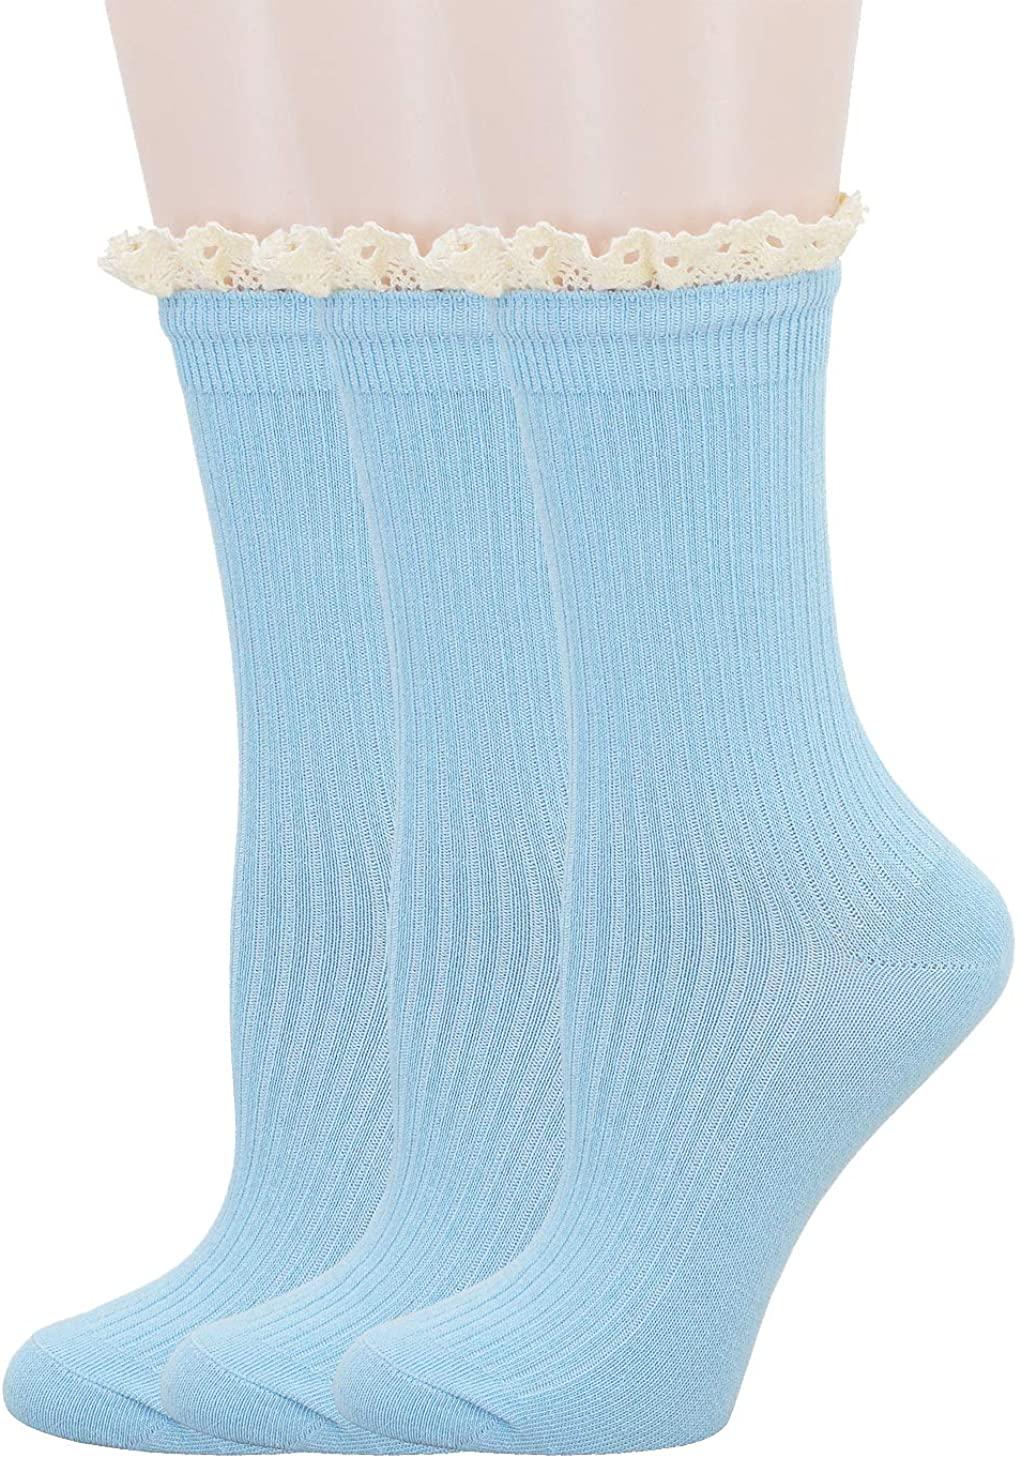 SRYL Womens Ankle Socks,Turn-Cuff Socks Women's Lace Ruffle Frilly Cotton Socks